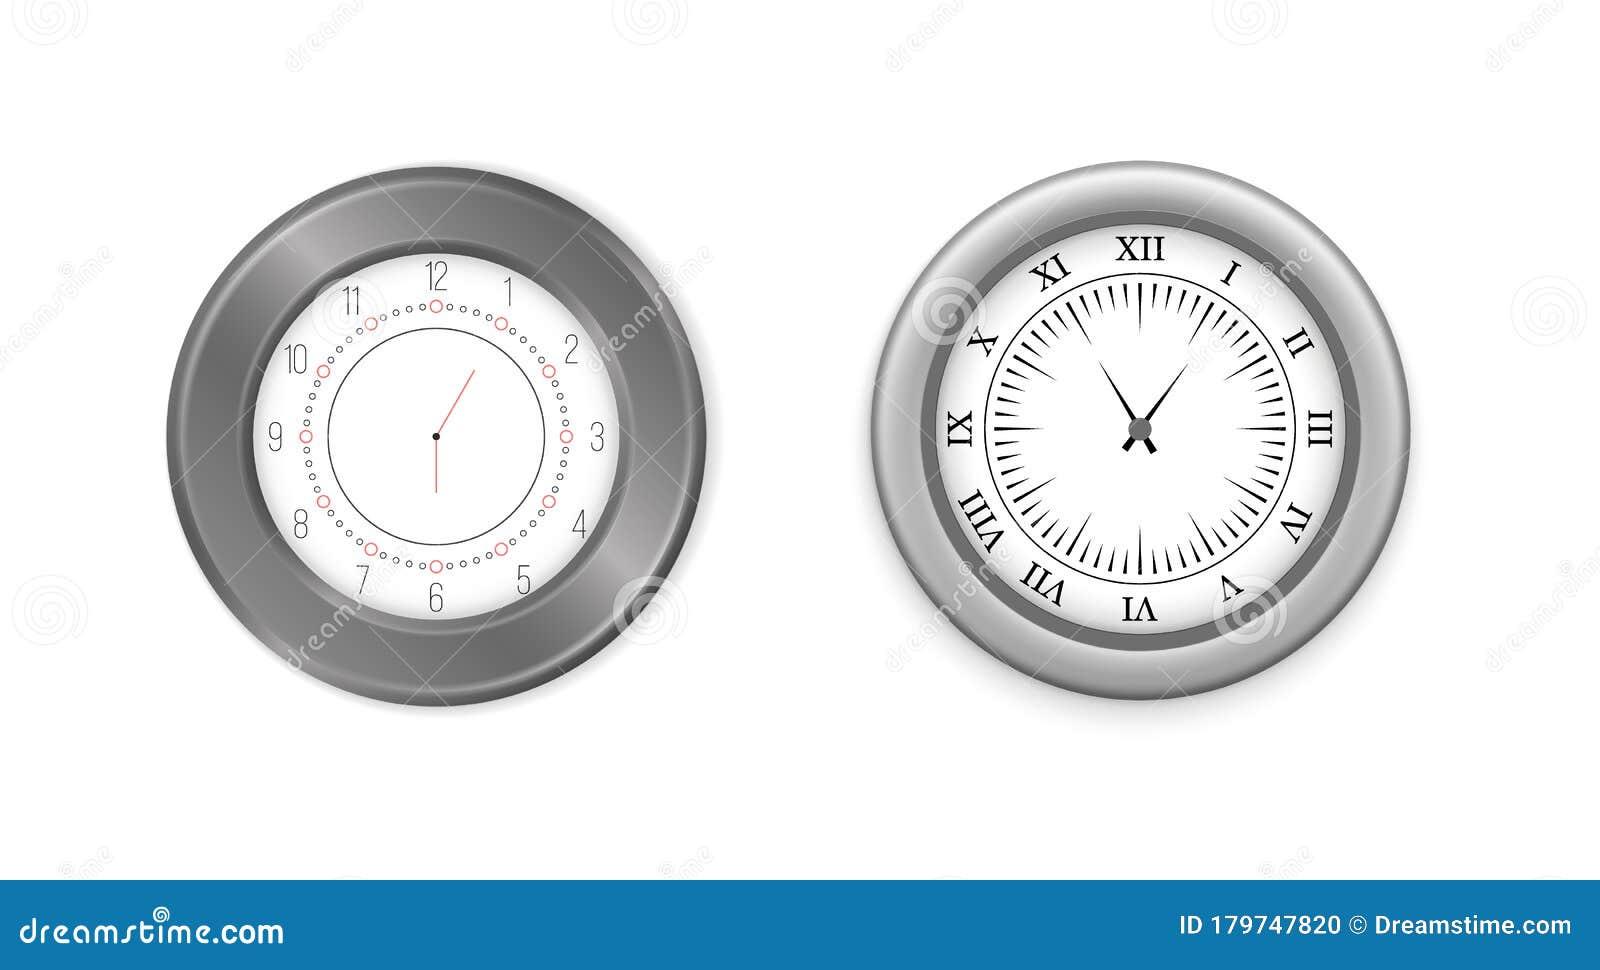 Modern Round Clocks Stock Vector Illustration Of Hand 179747820